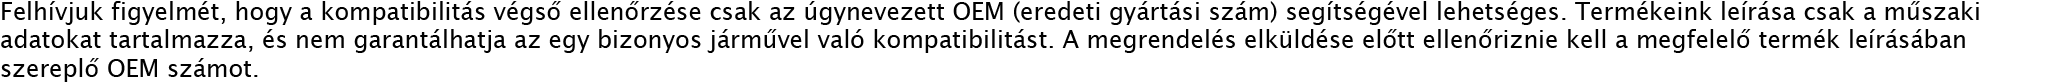 DENSO S41, 12290-R60-002, 12290-R60-U01, 12290-R60-U02, 9807B-561BP00 Gyújtógyertya